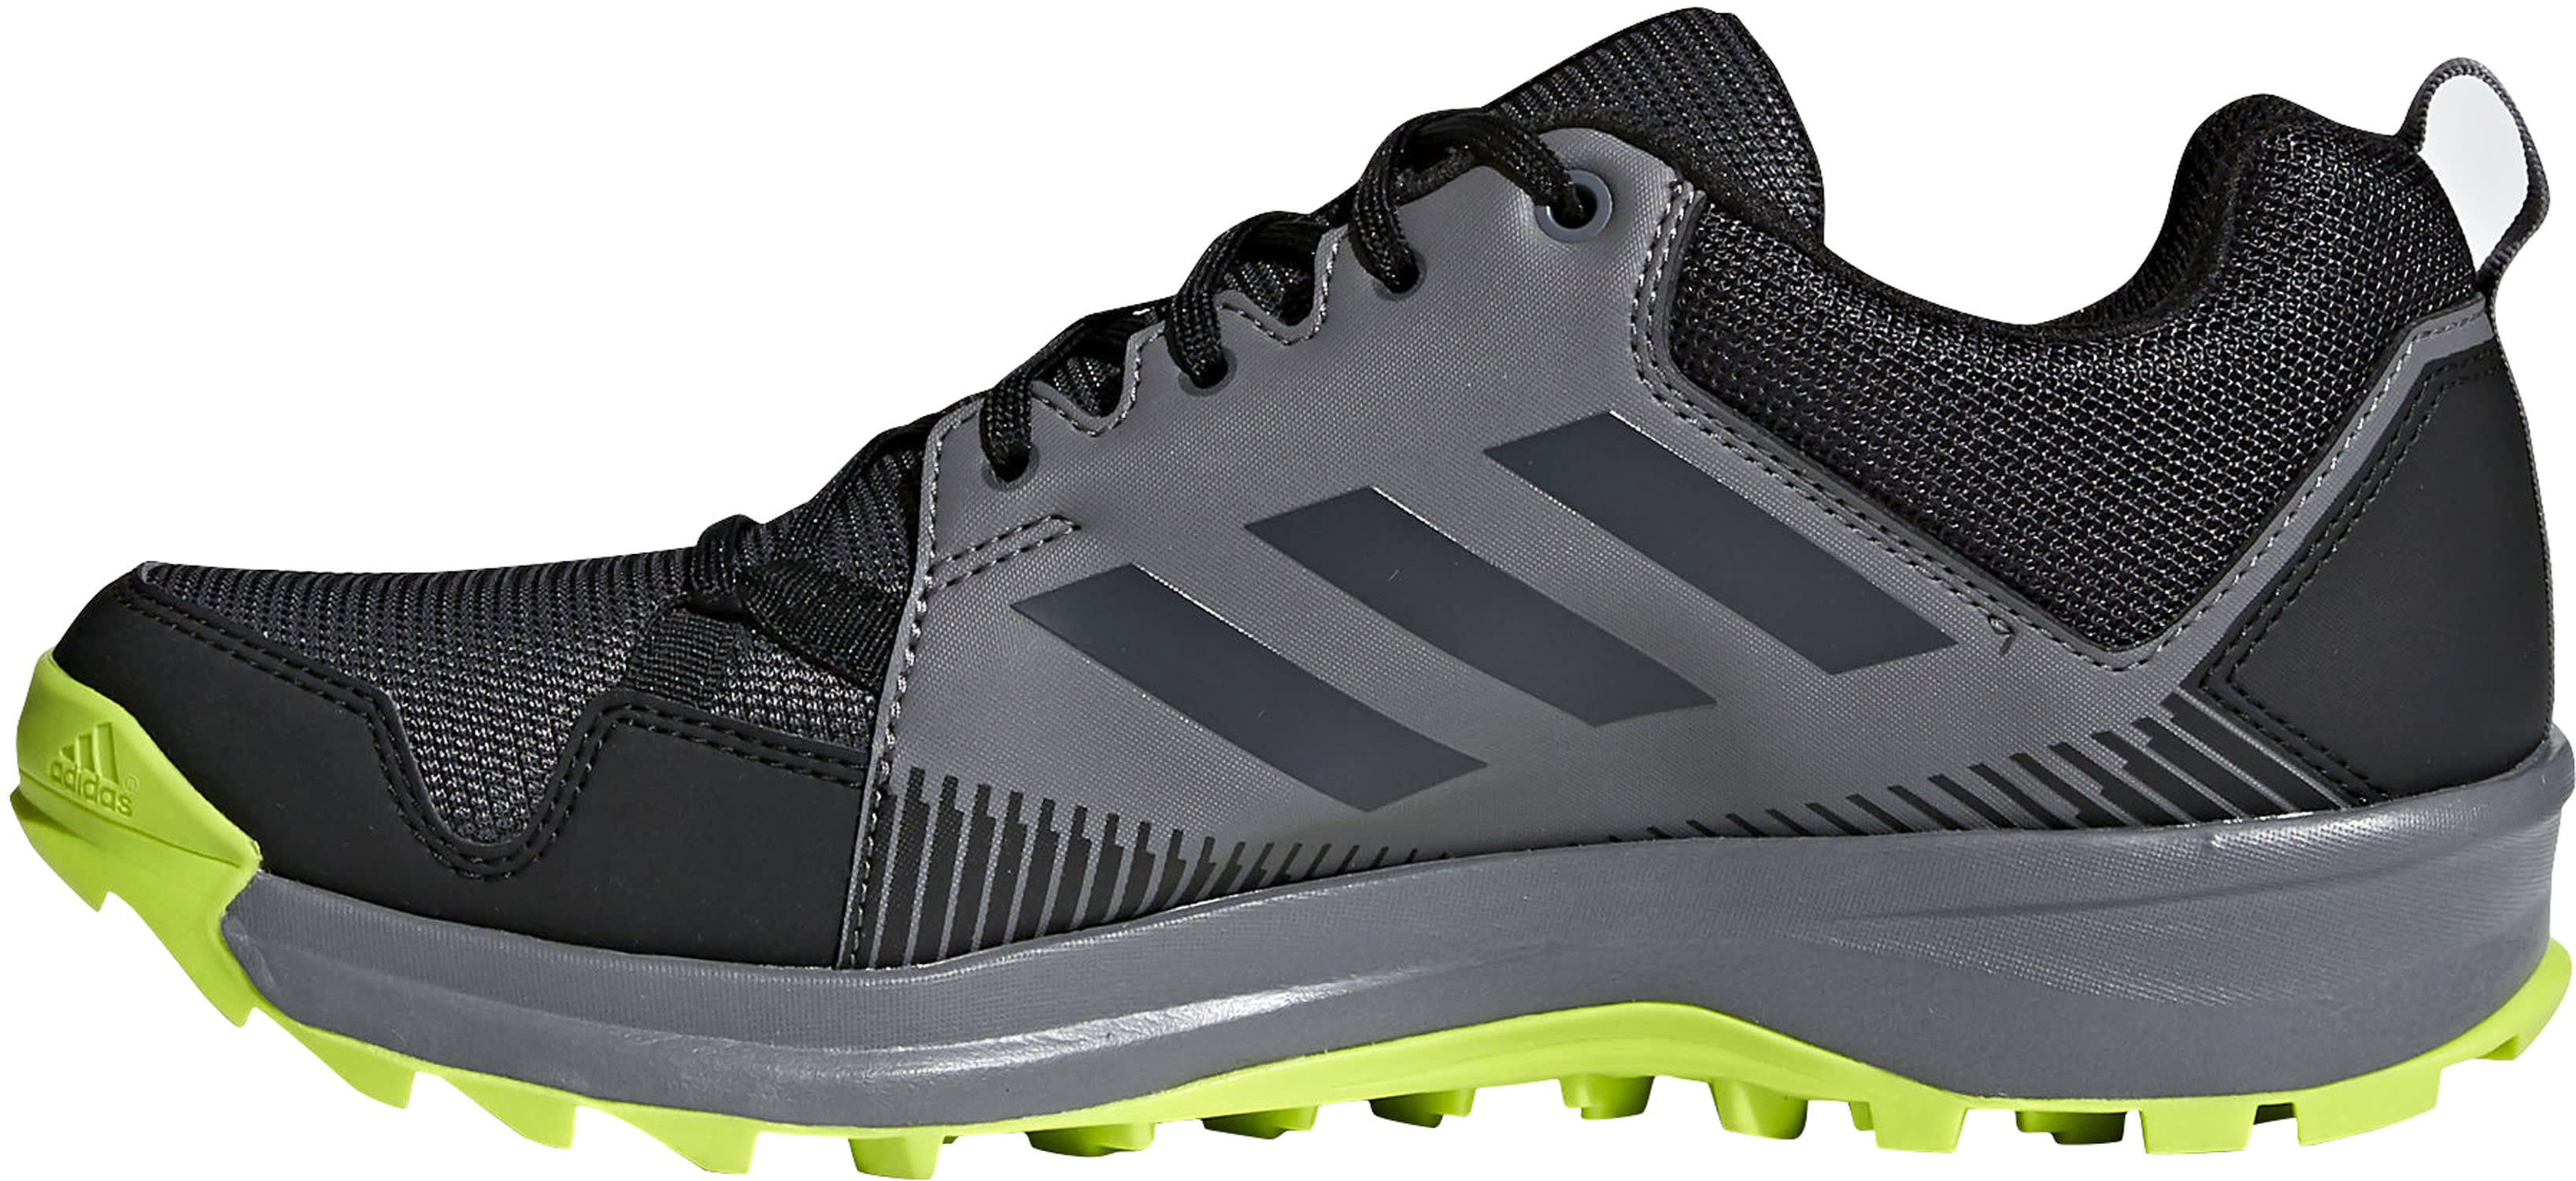 897541850f0 Adidas Terrex Tracerocker Hiking Shoes - thumbnail 3